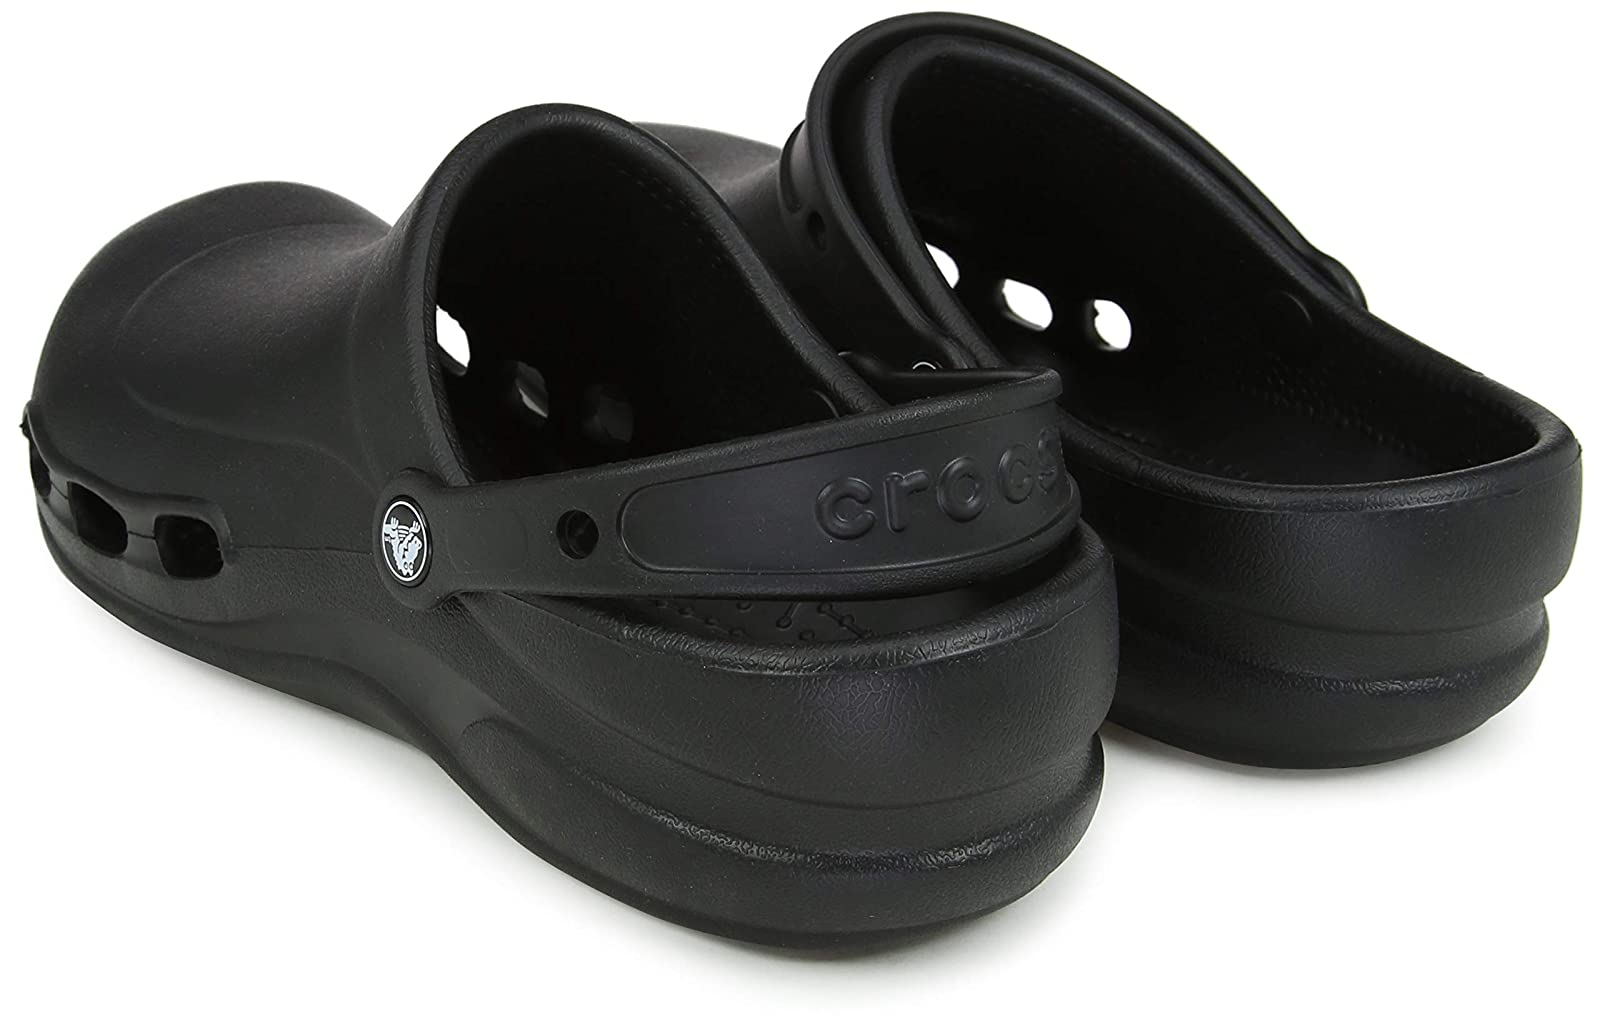 Crocs Unisex Specialist Vent Clog Black 11 10074M Black - 9